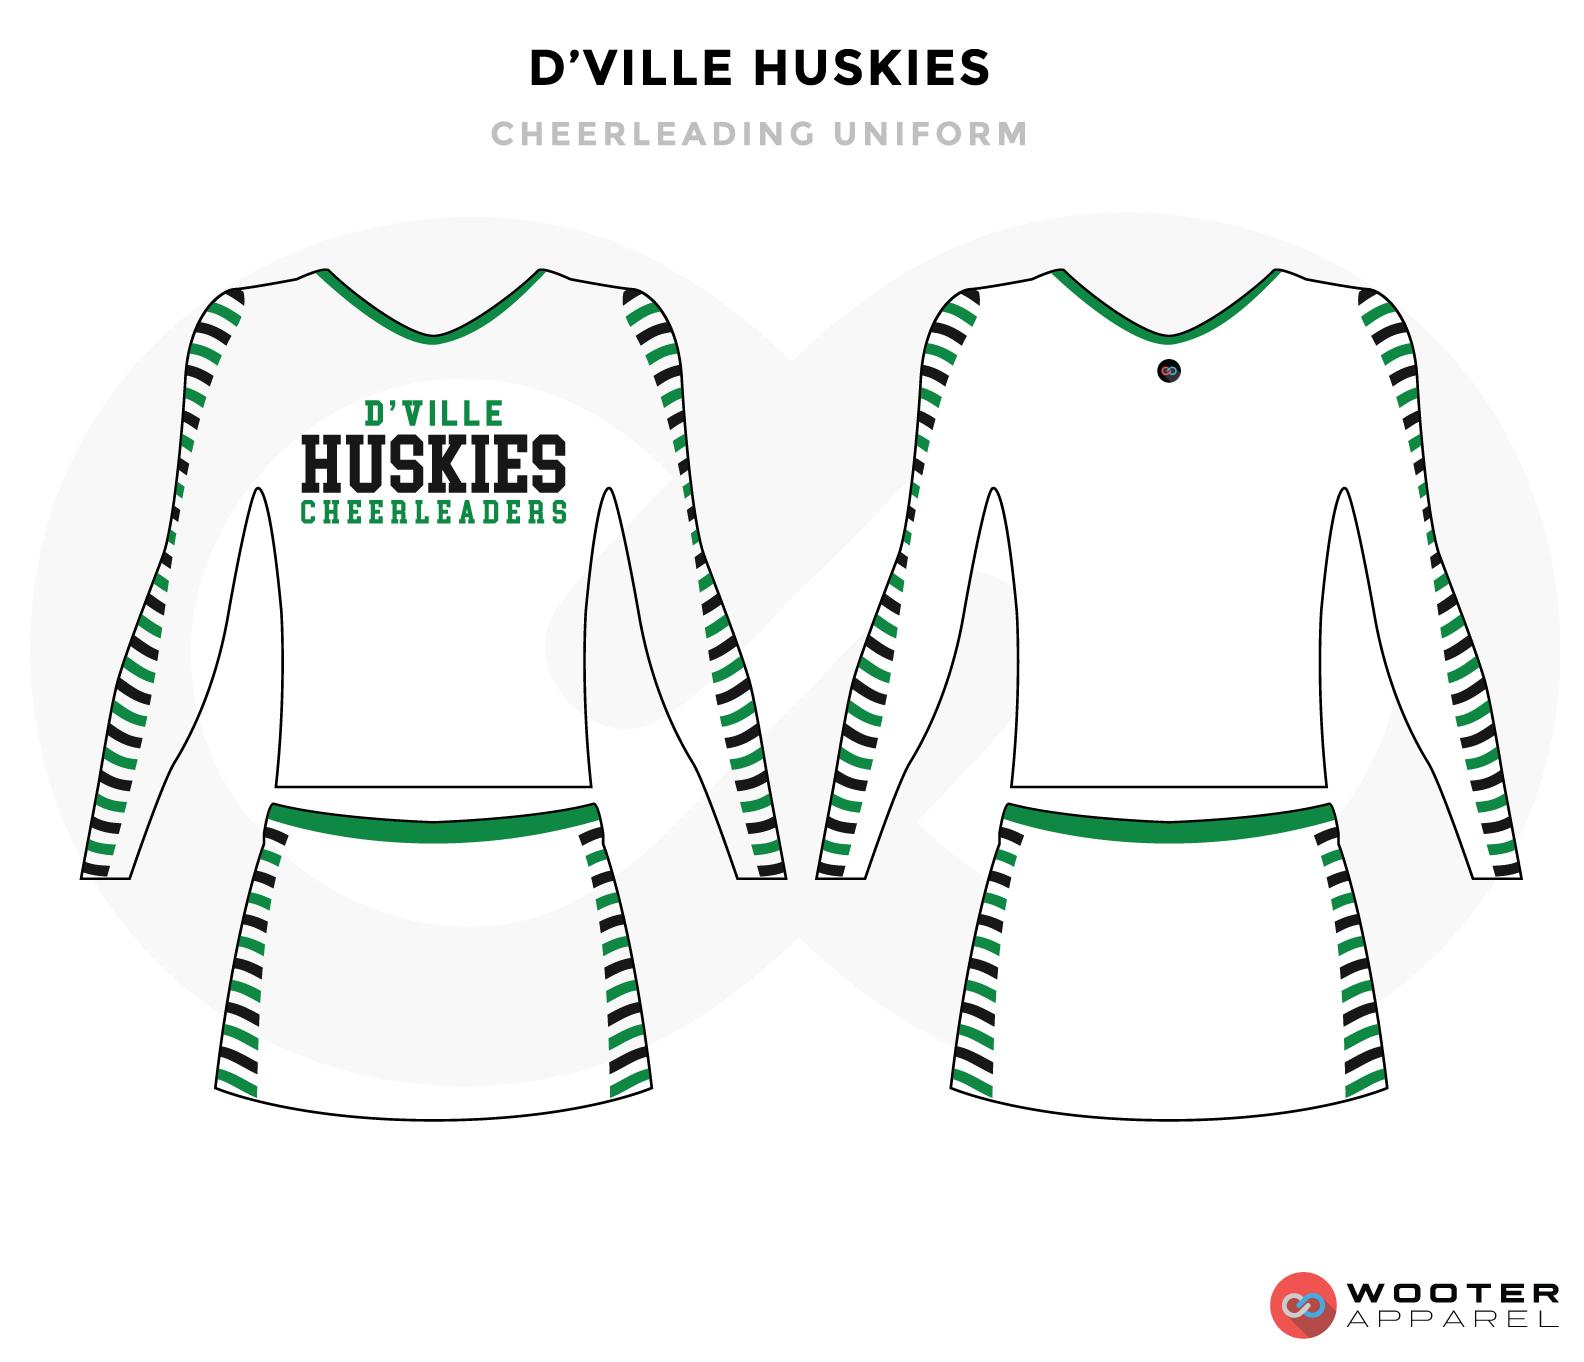 D'VILLE HUSKIES white green black cheerleading uniforms, top, and skirt